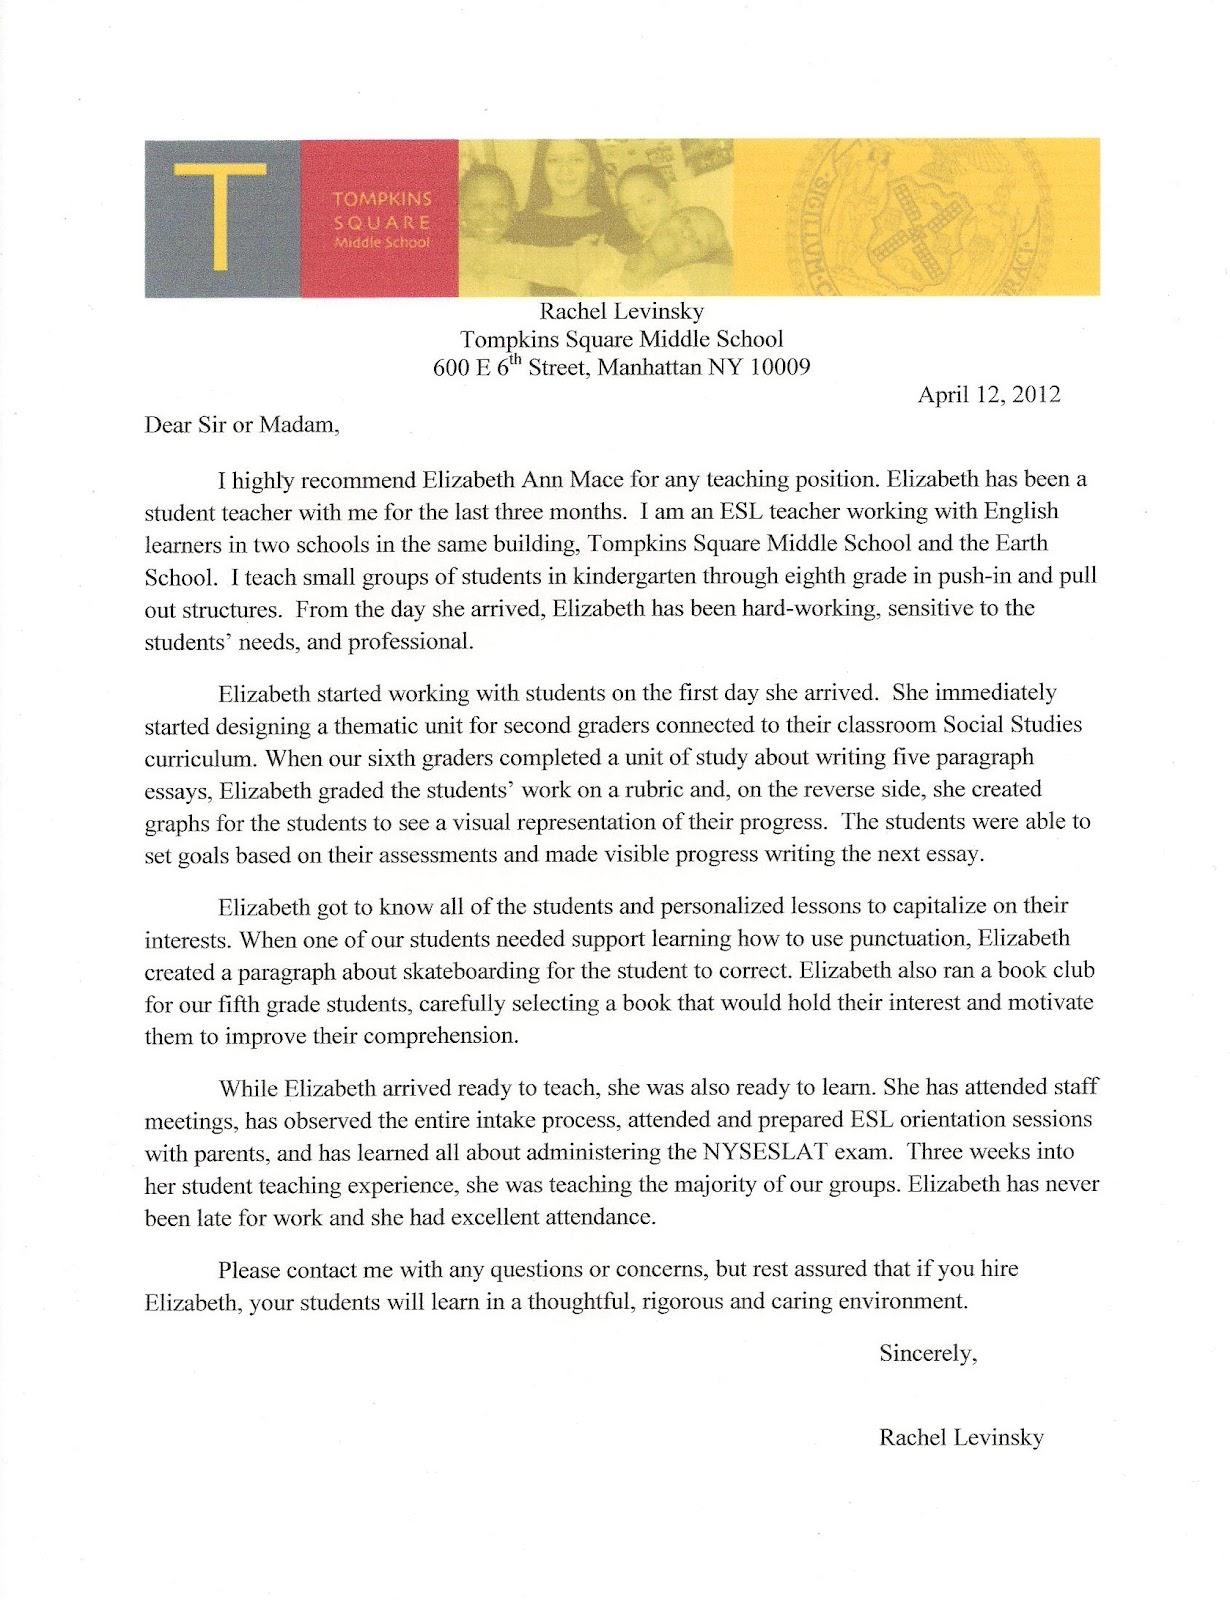 cooperating teacher letter recommendation